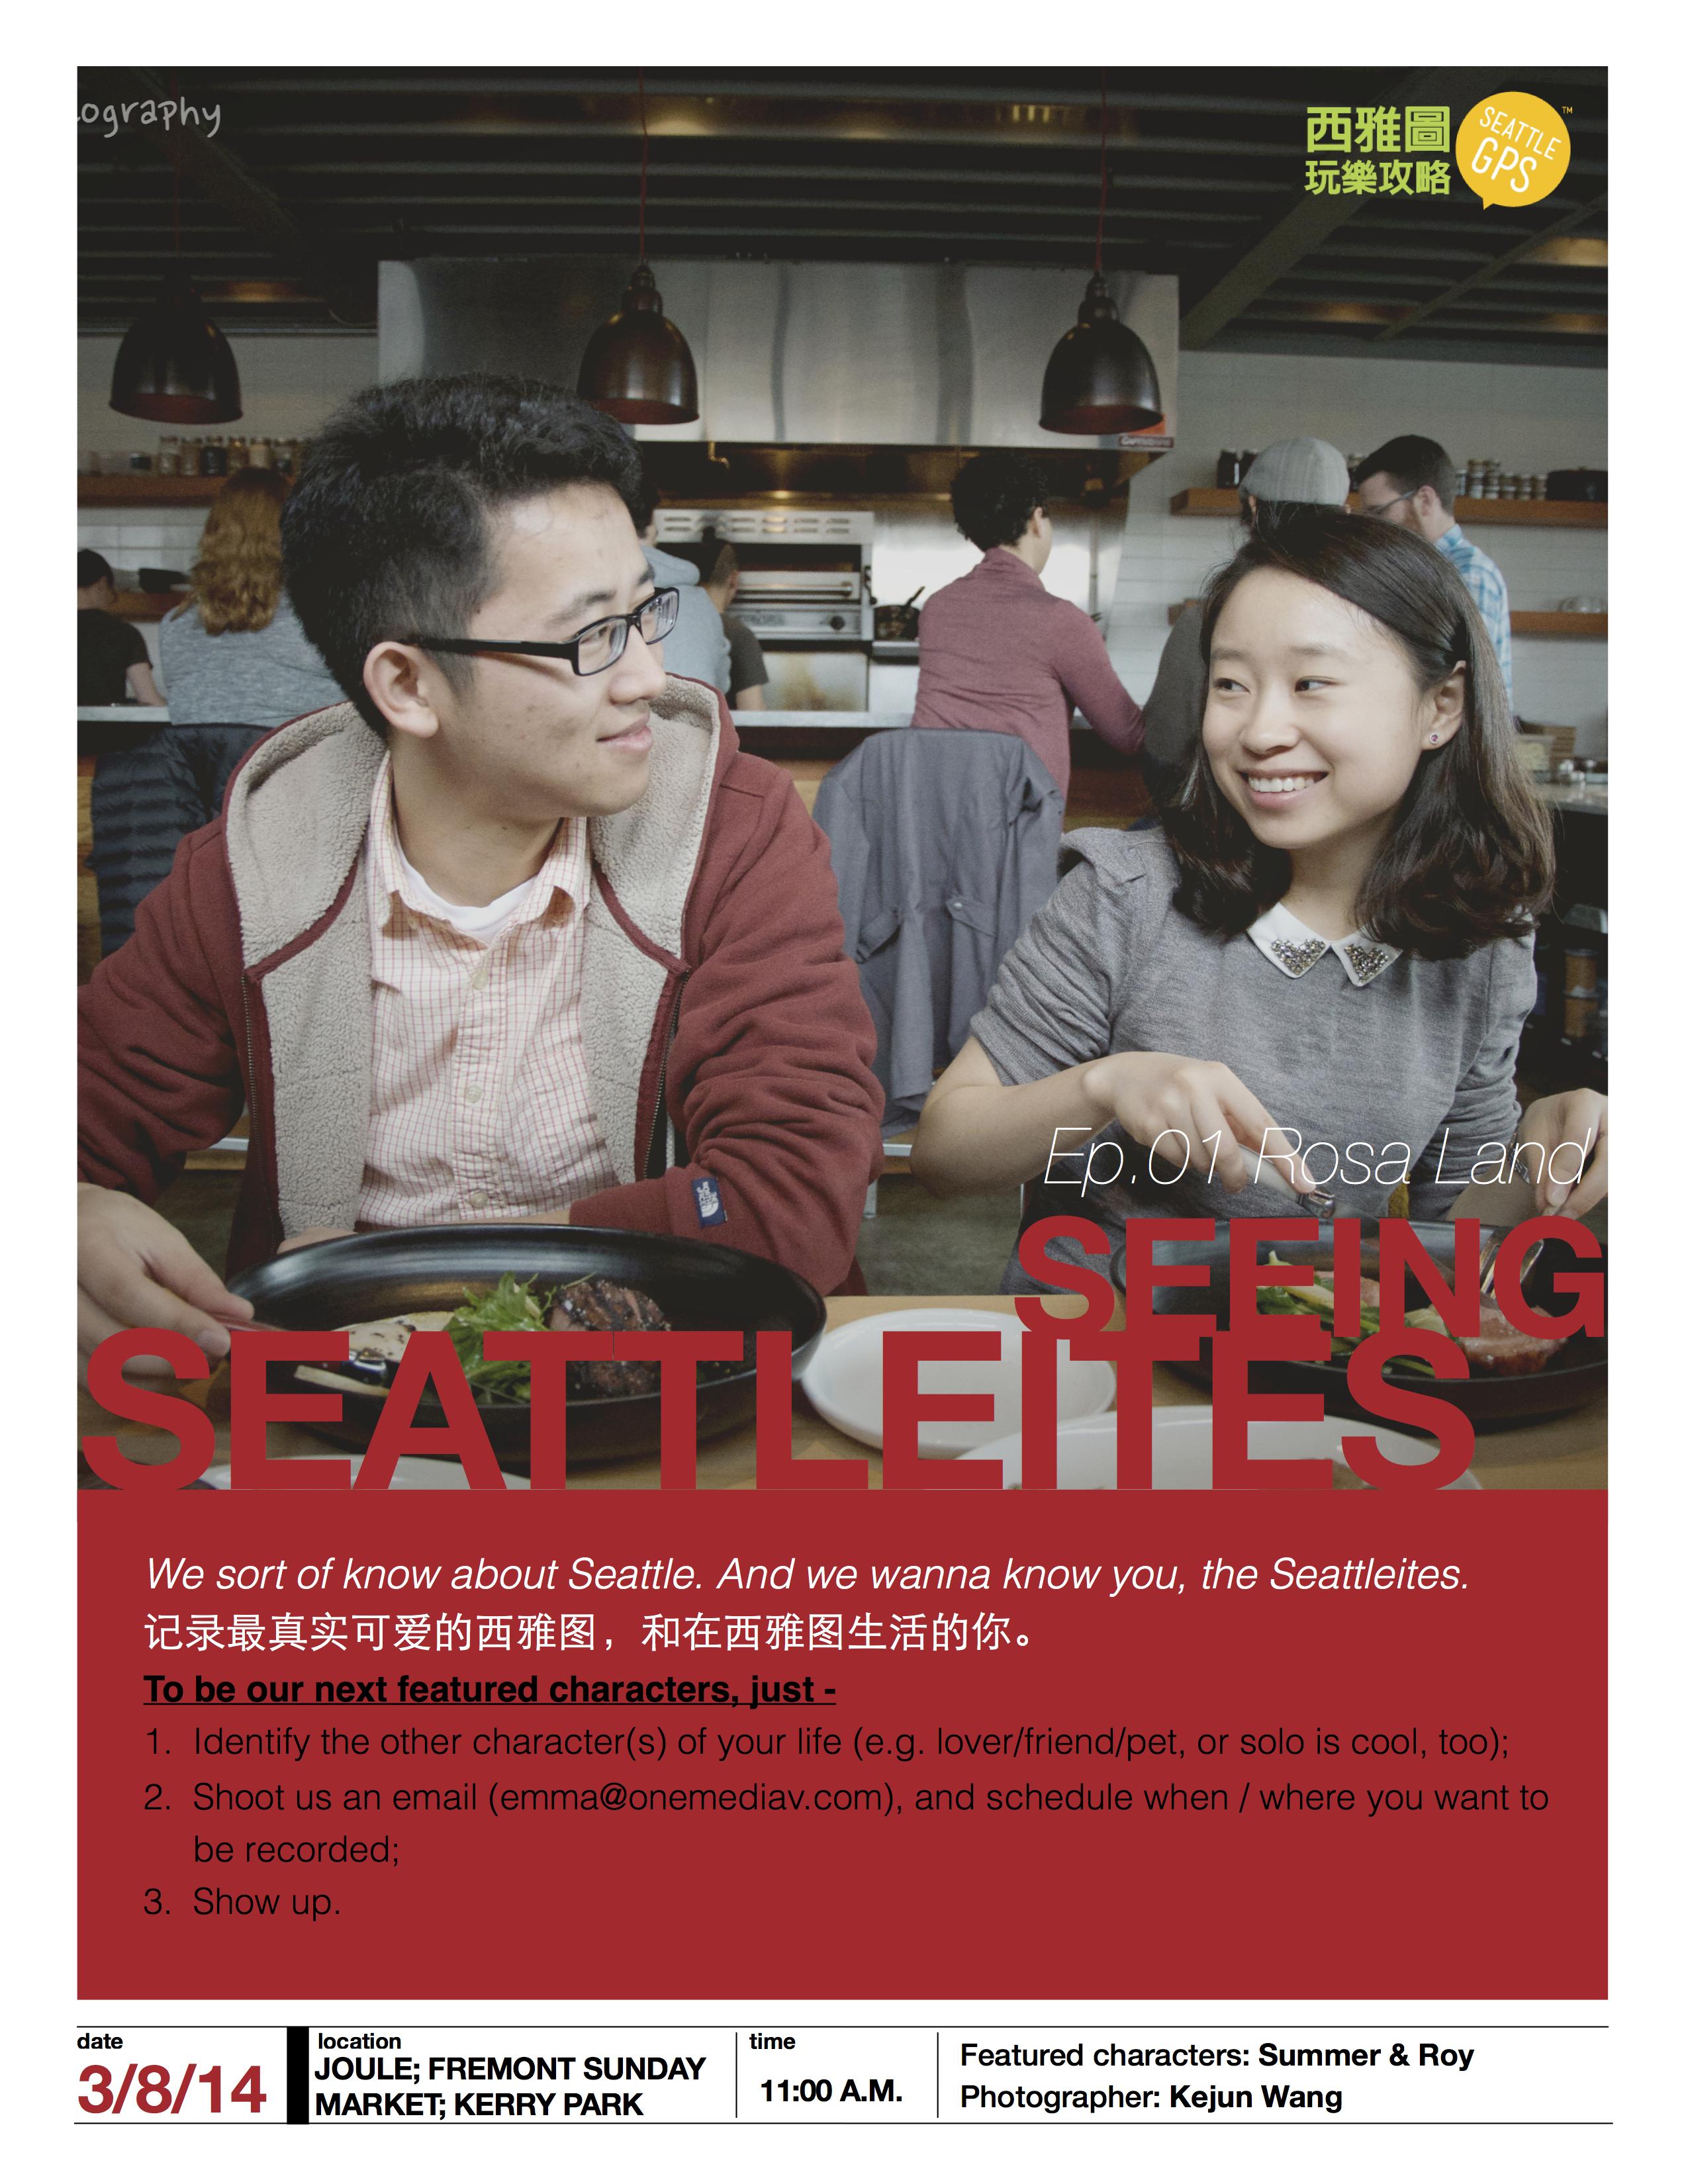 Seeing Seattleietes-Rosa Land